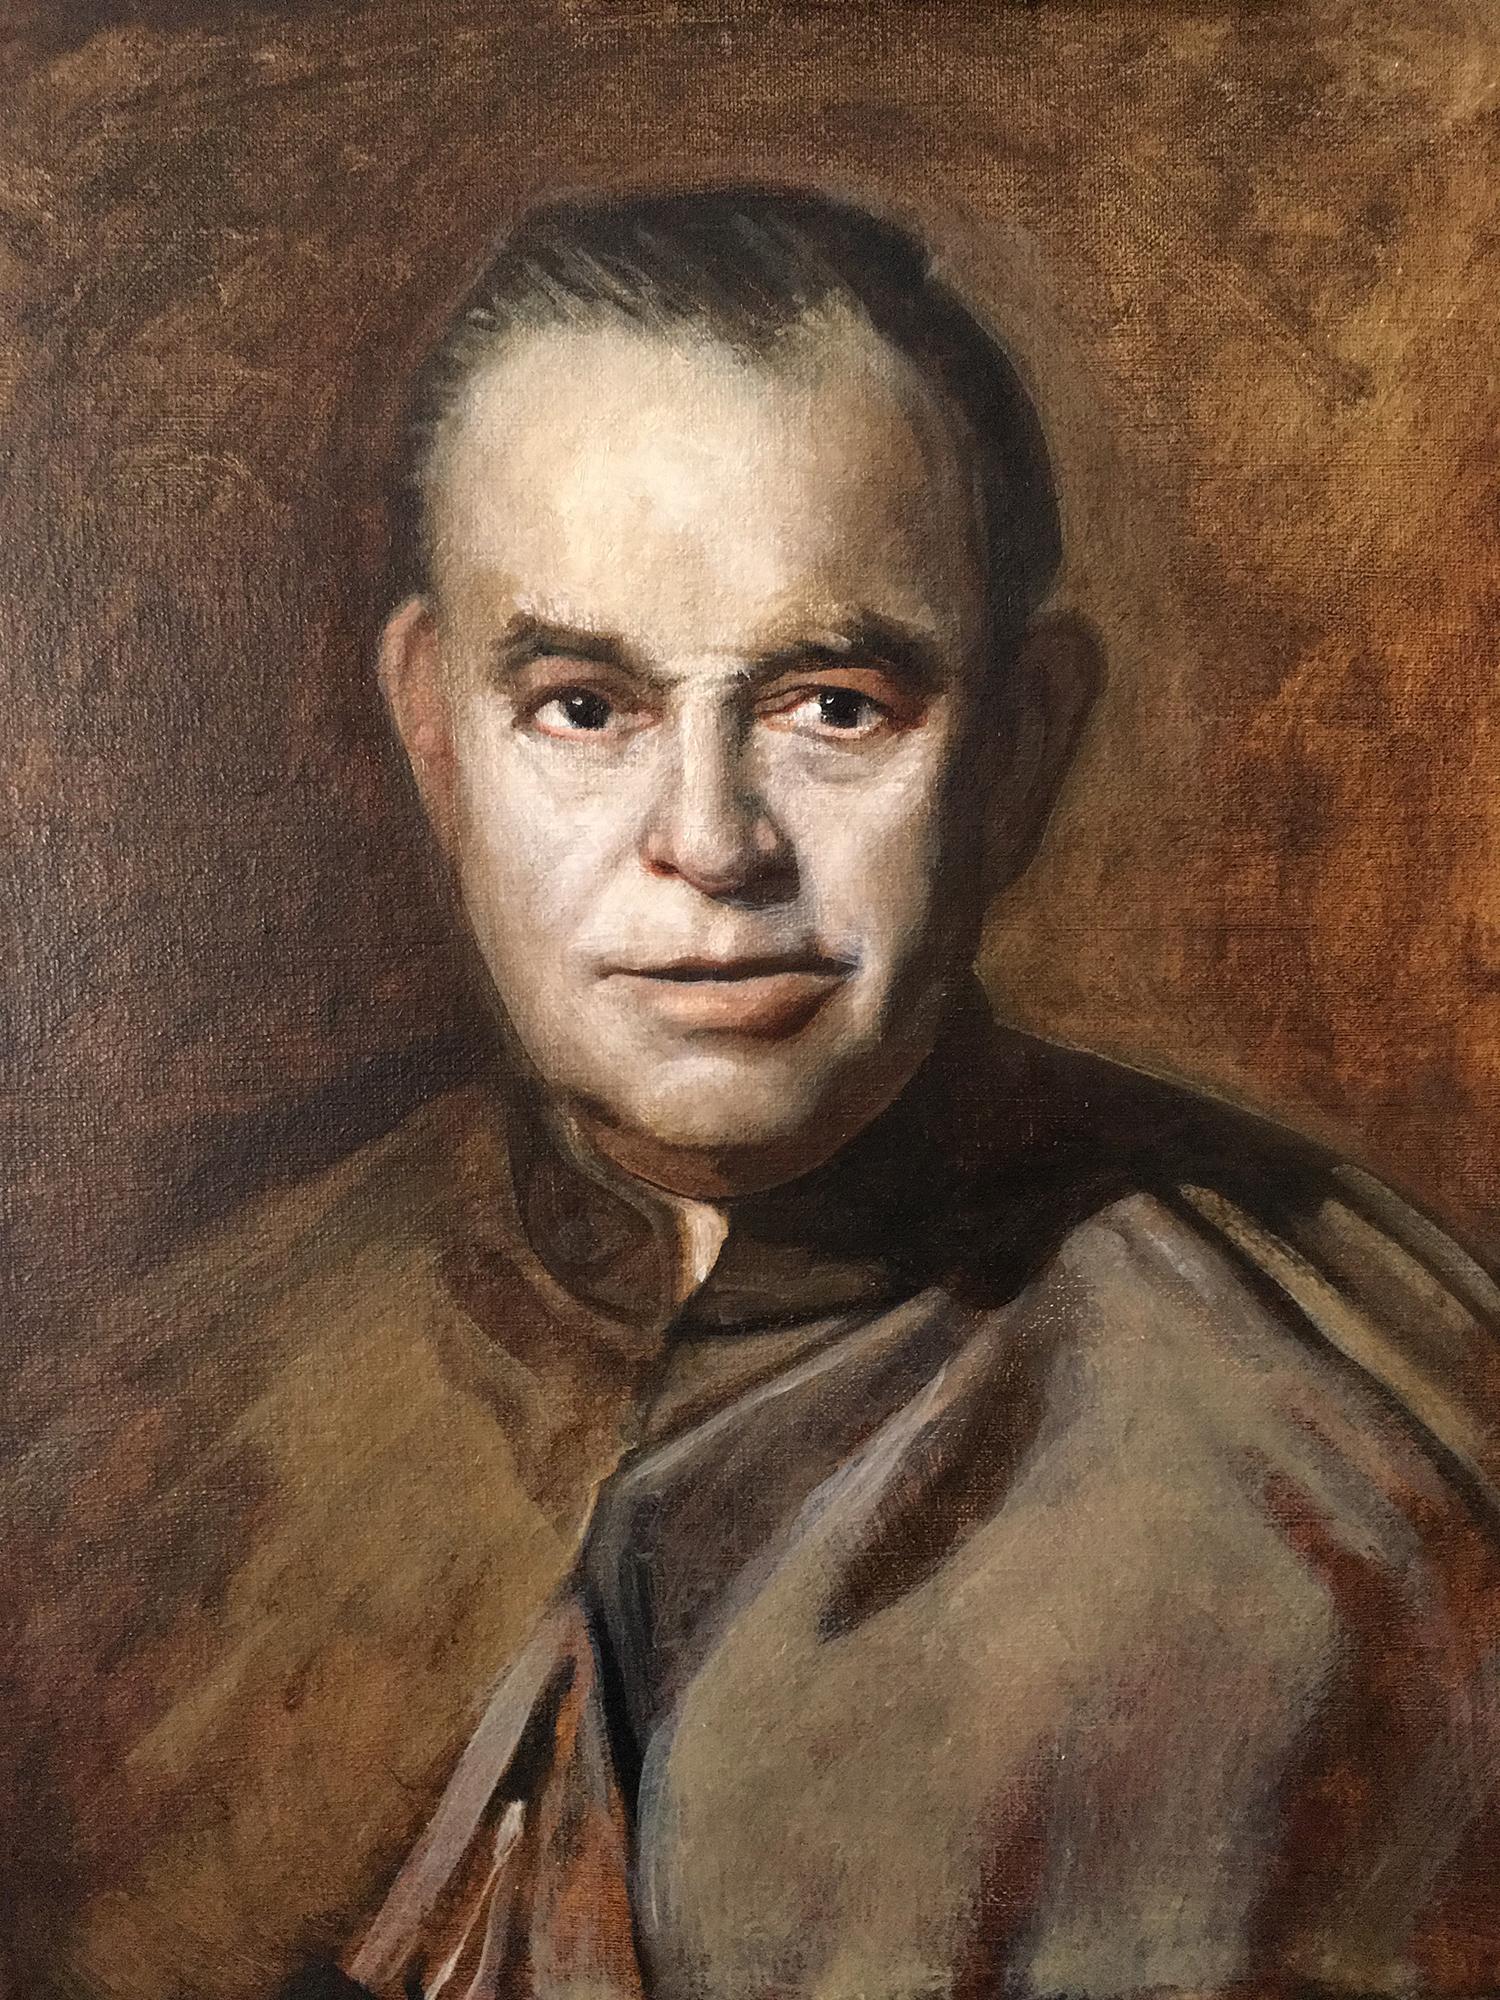 Client: Rev Gerry Schreck, Rector Cathedral of St John the Baptist, Savannah Georgia, Langley Portrait of Monsignor James T. McNamara,oil on canvas 2017